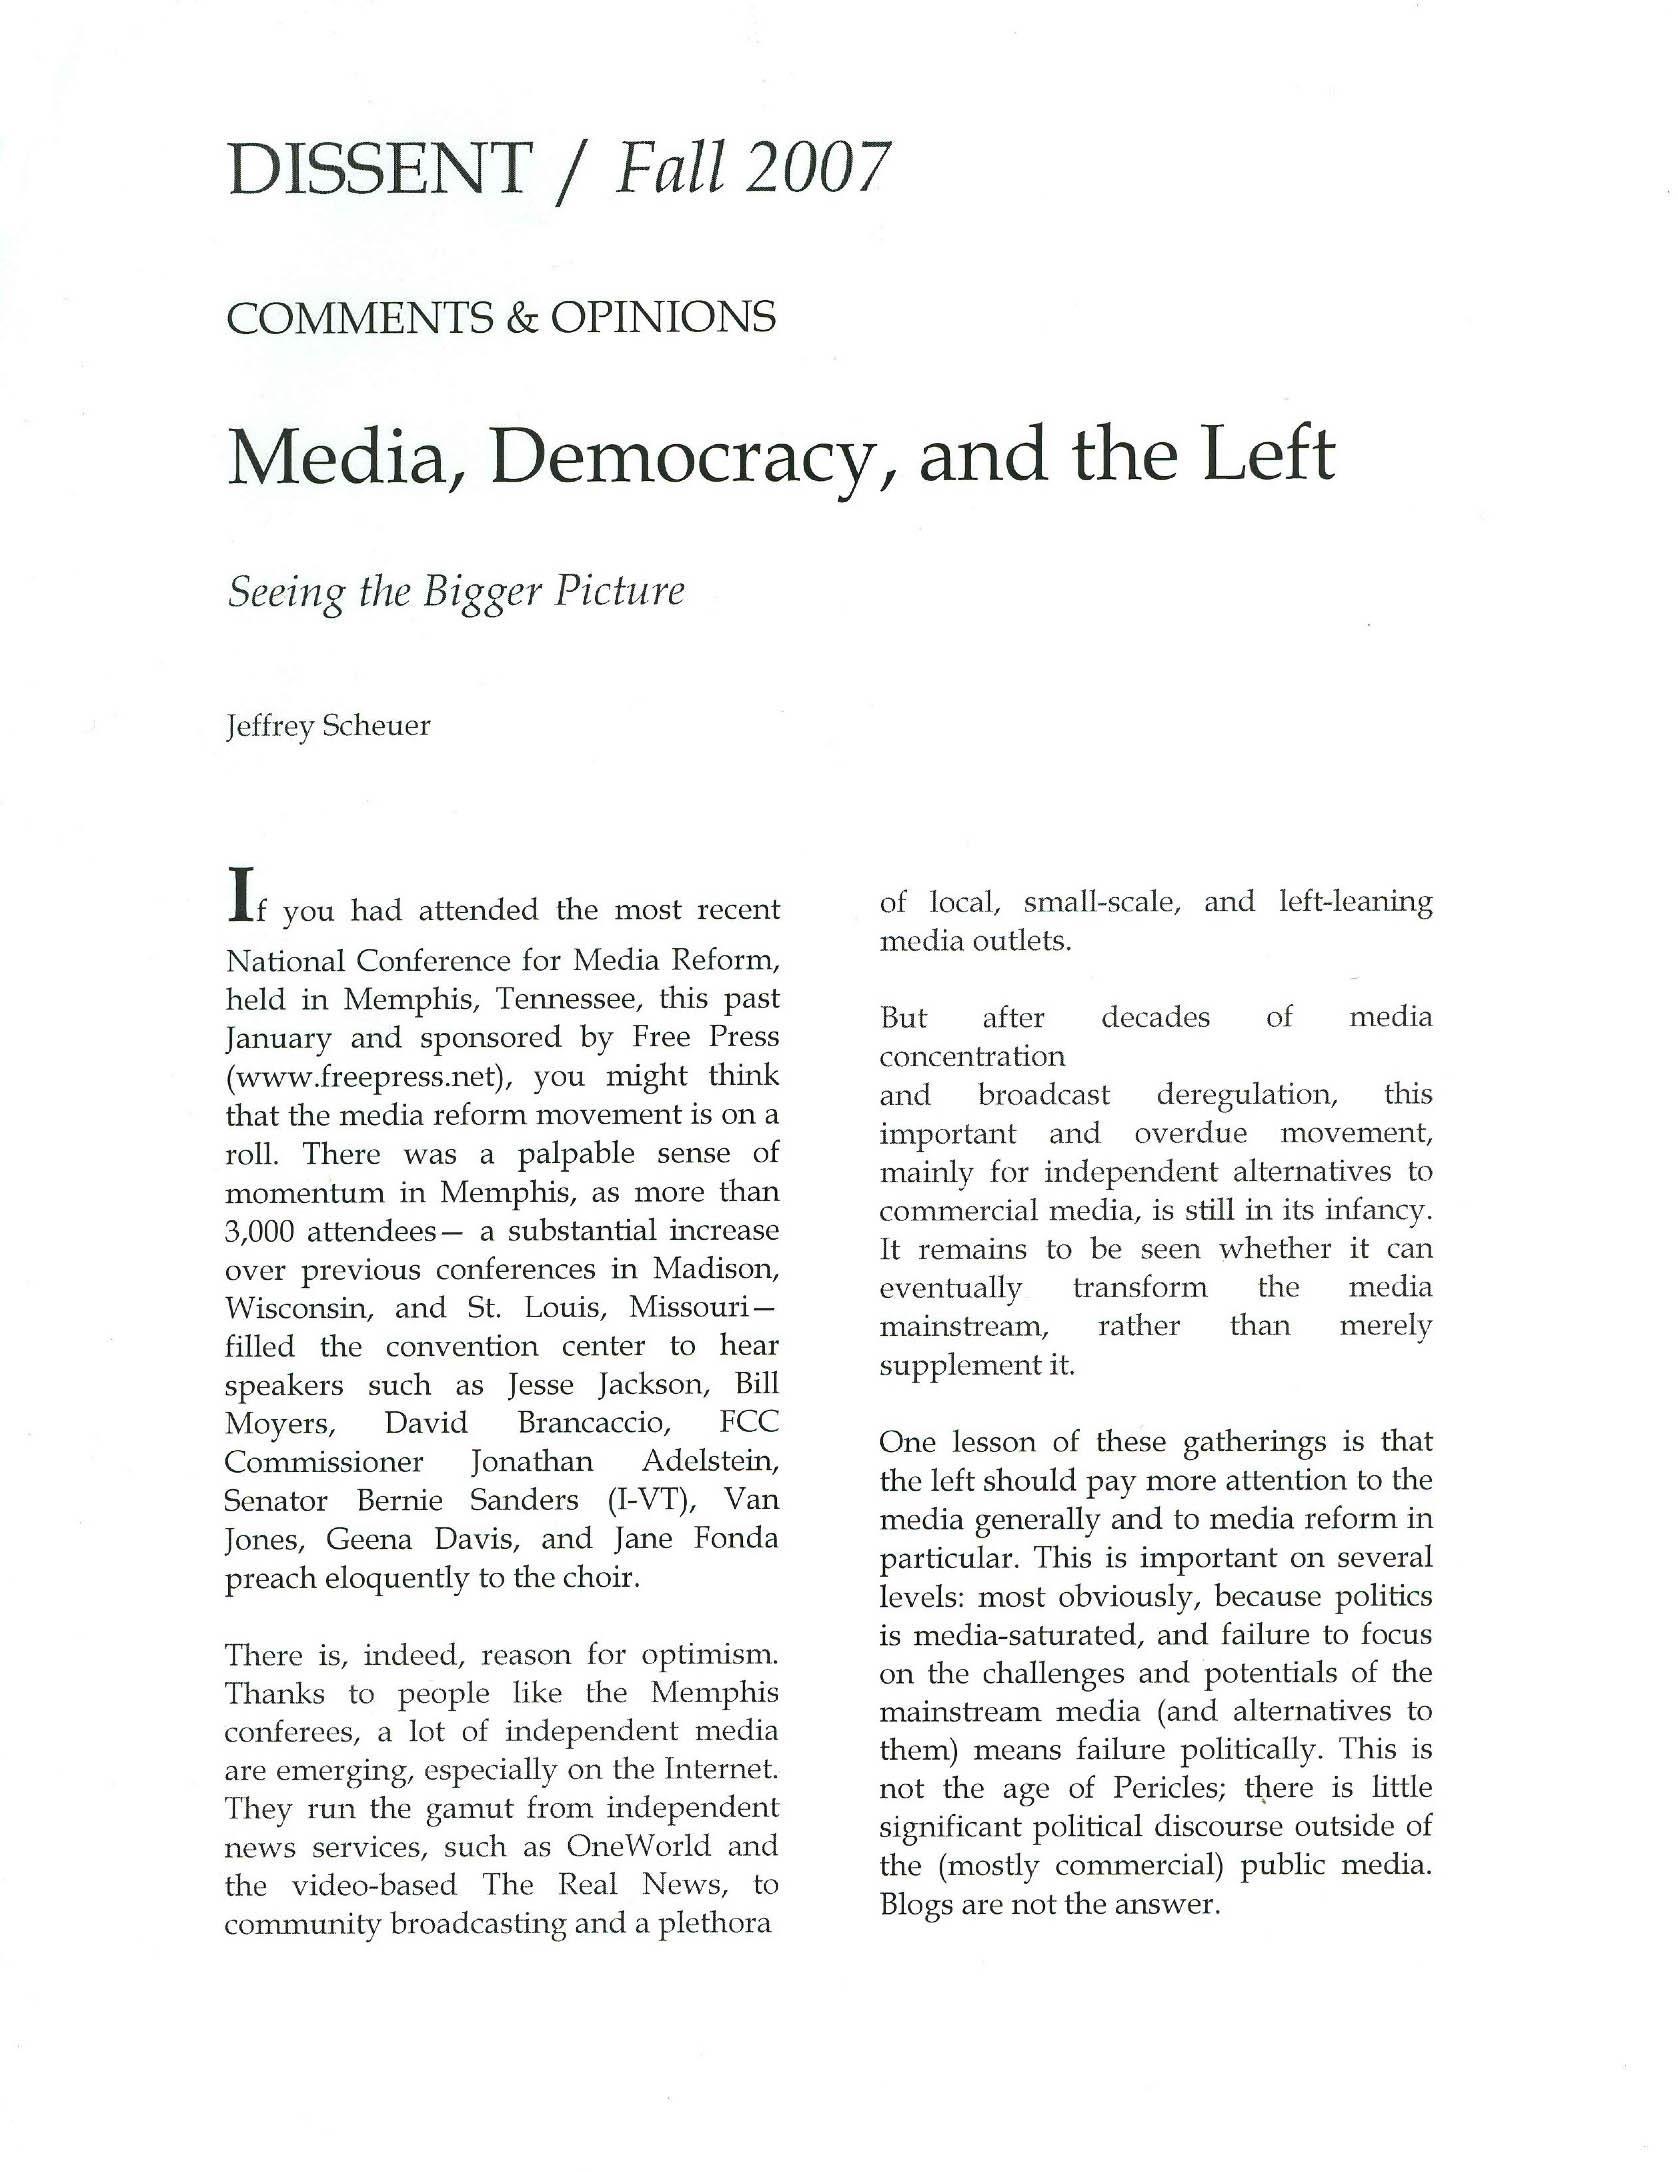 Media-and-Democracy1.jpg